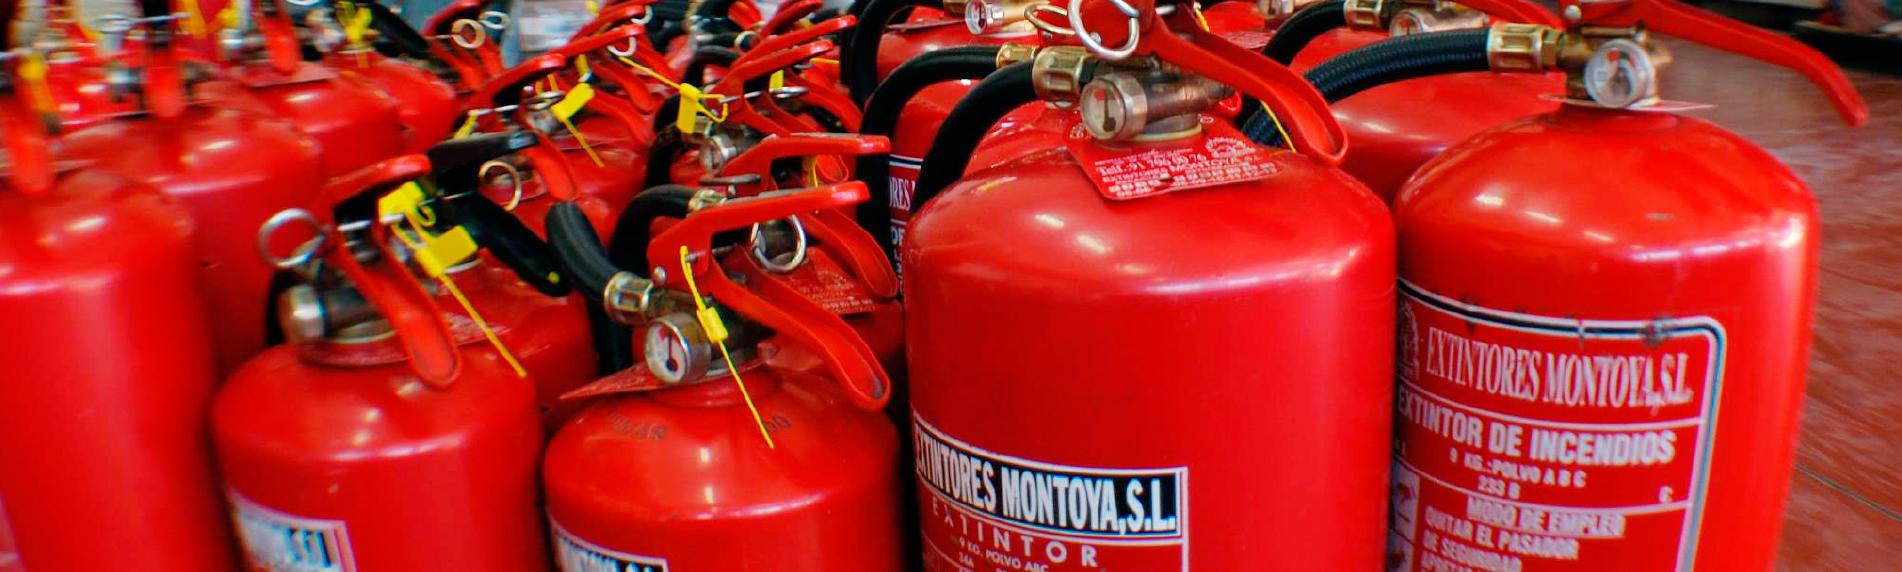 extintores madrid